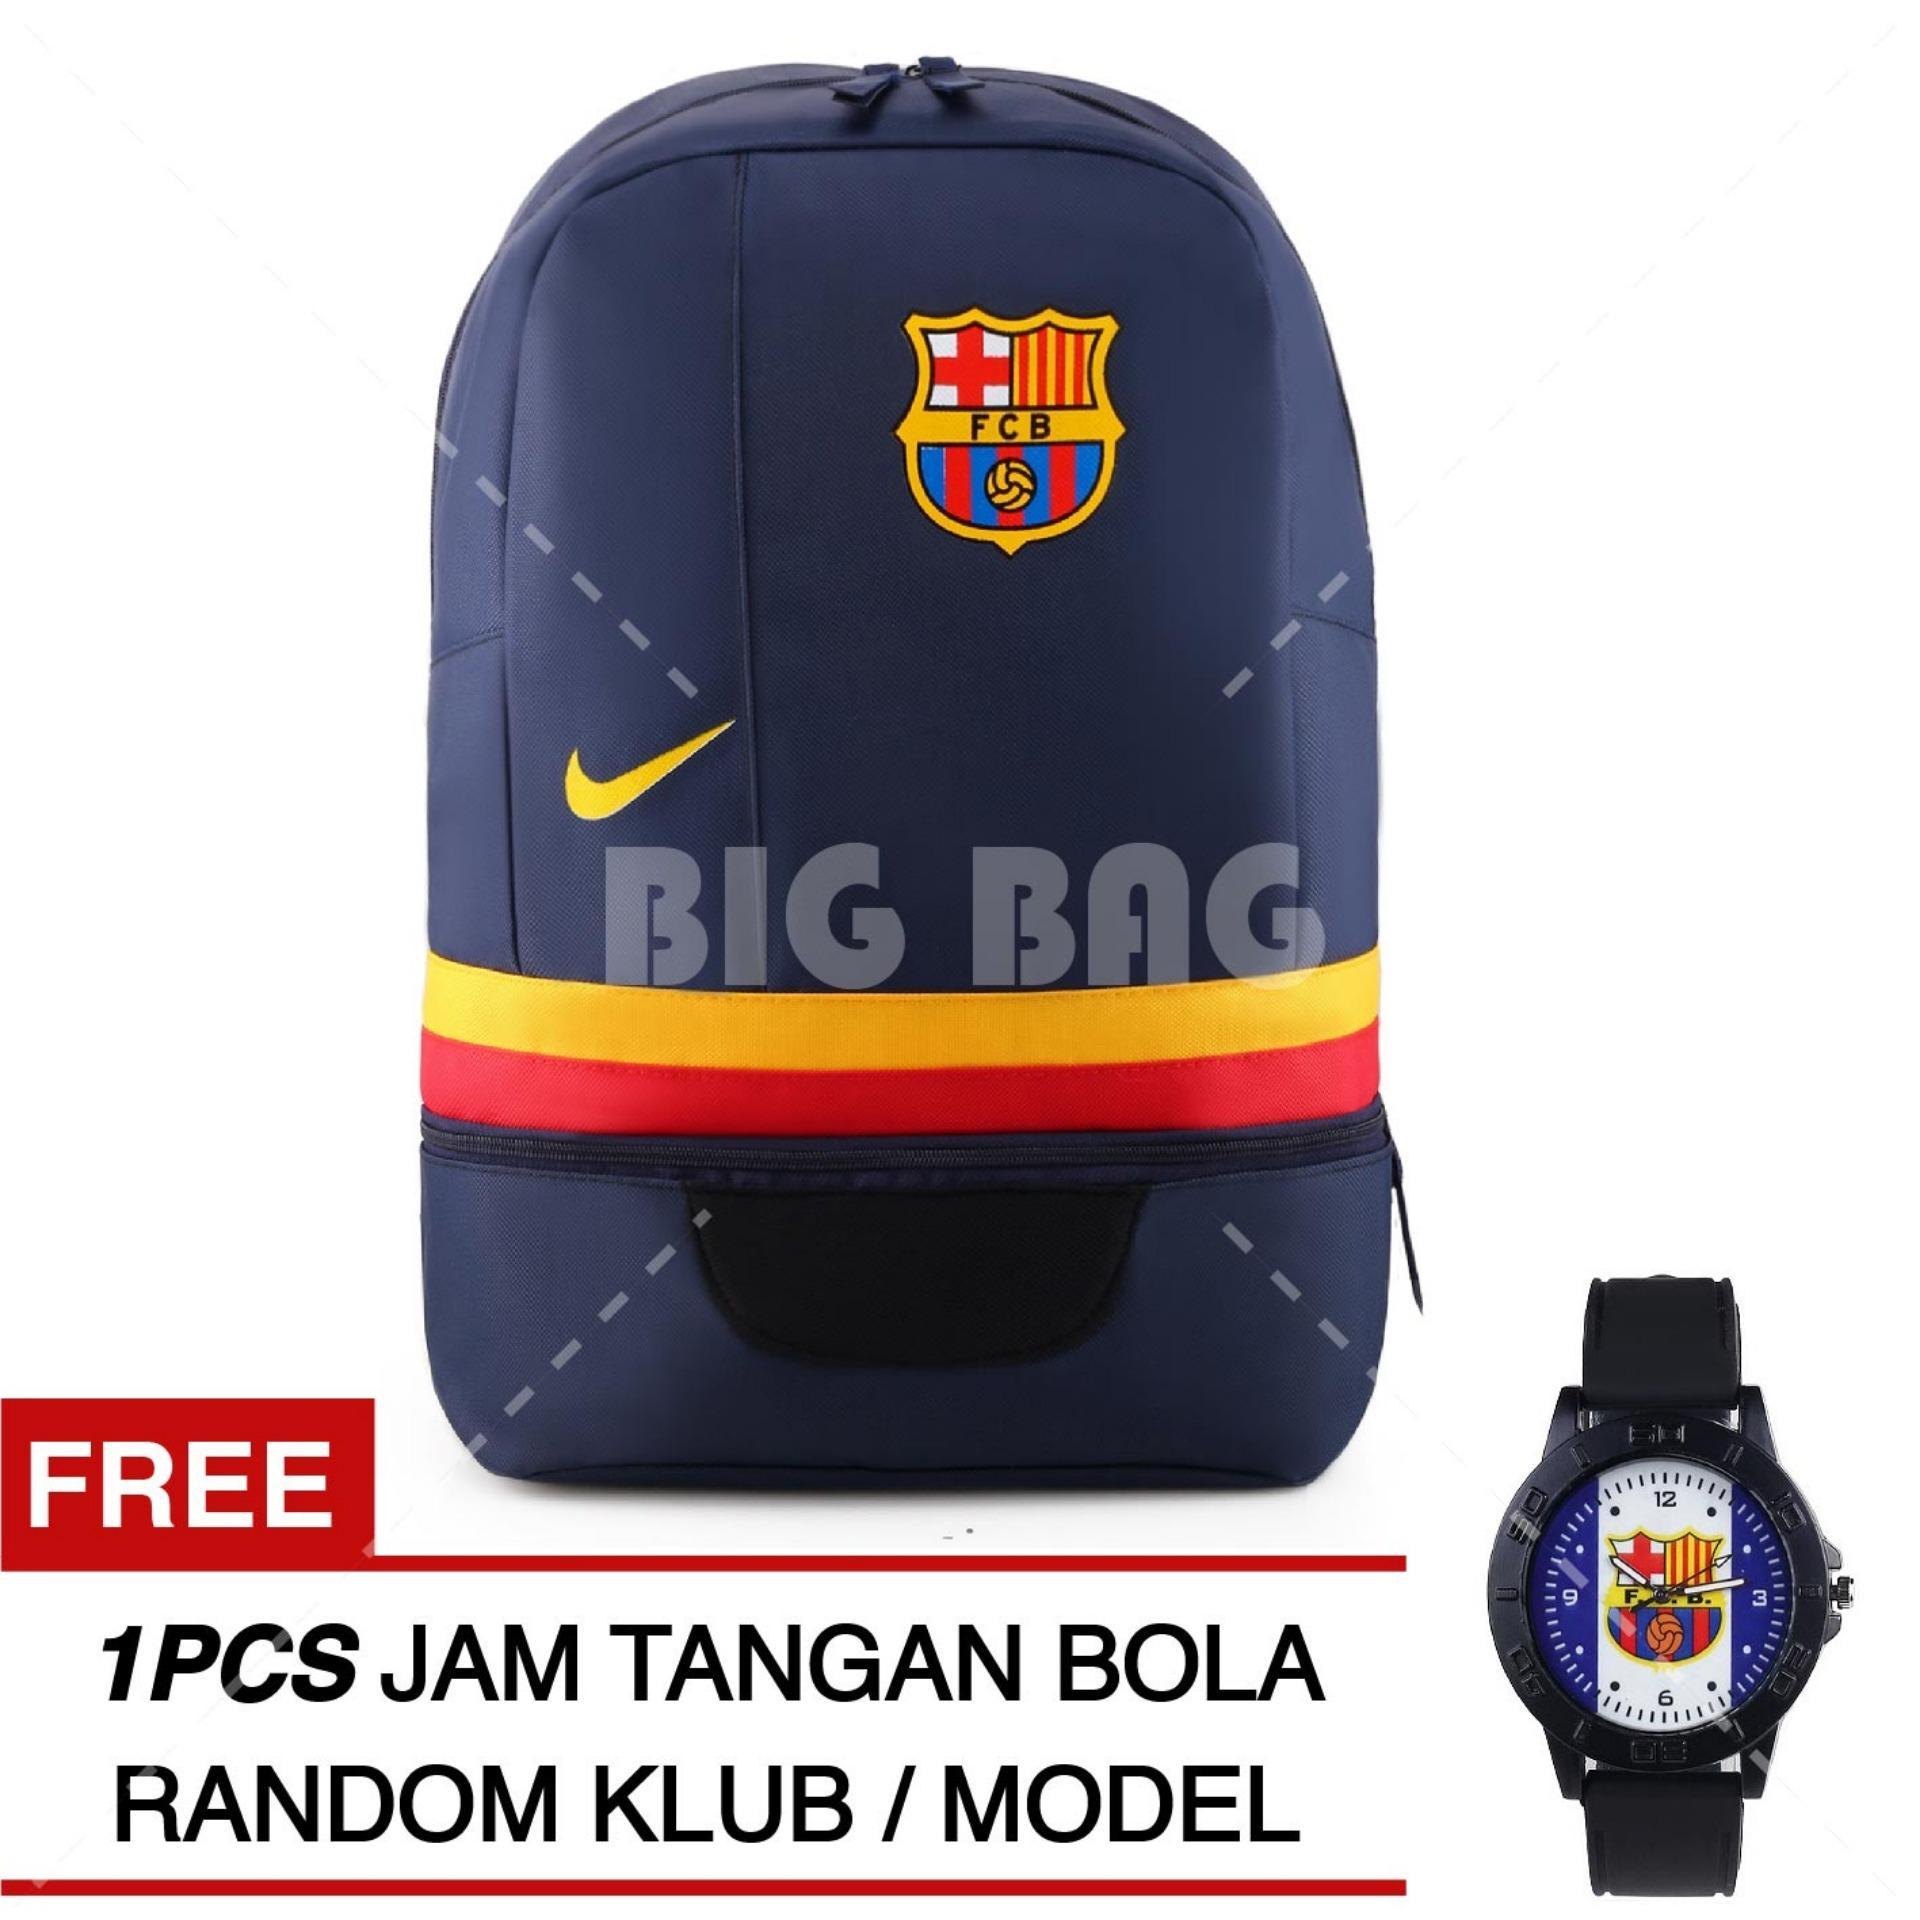 Tas Ransel Nike Bola Pria FC Barcelona Laptop Backpack Men Soccer Editions - Navy + Raincover + FREE Jam Tangan  Pria Random Color / Model